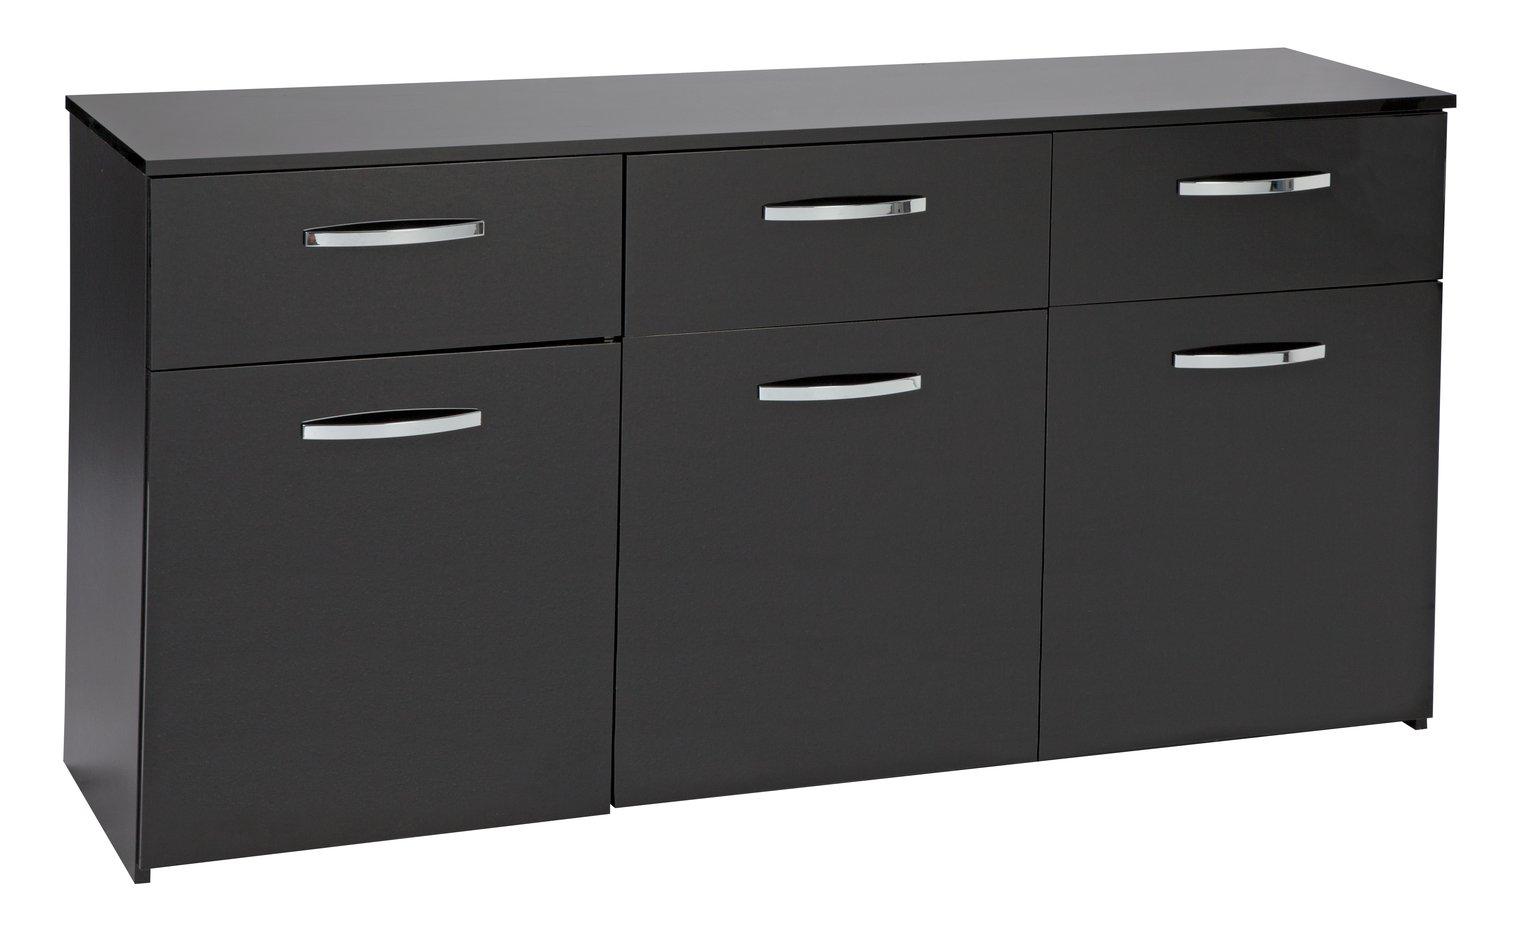 Hygena Hayward 3 Door 3 Drawer Sideboard - Black